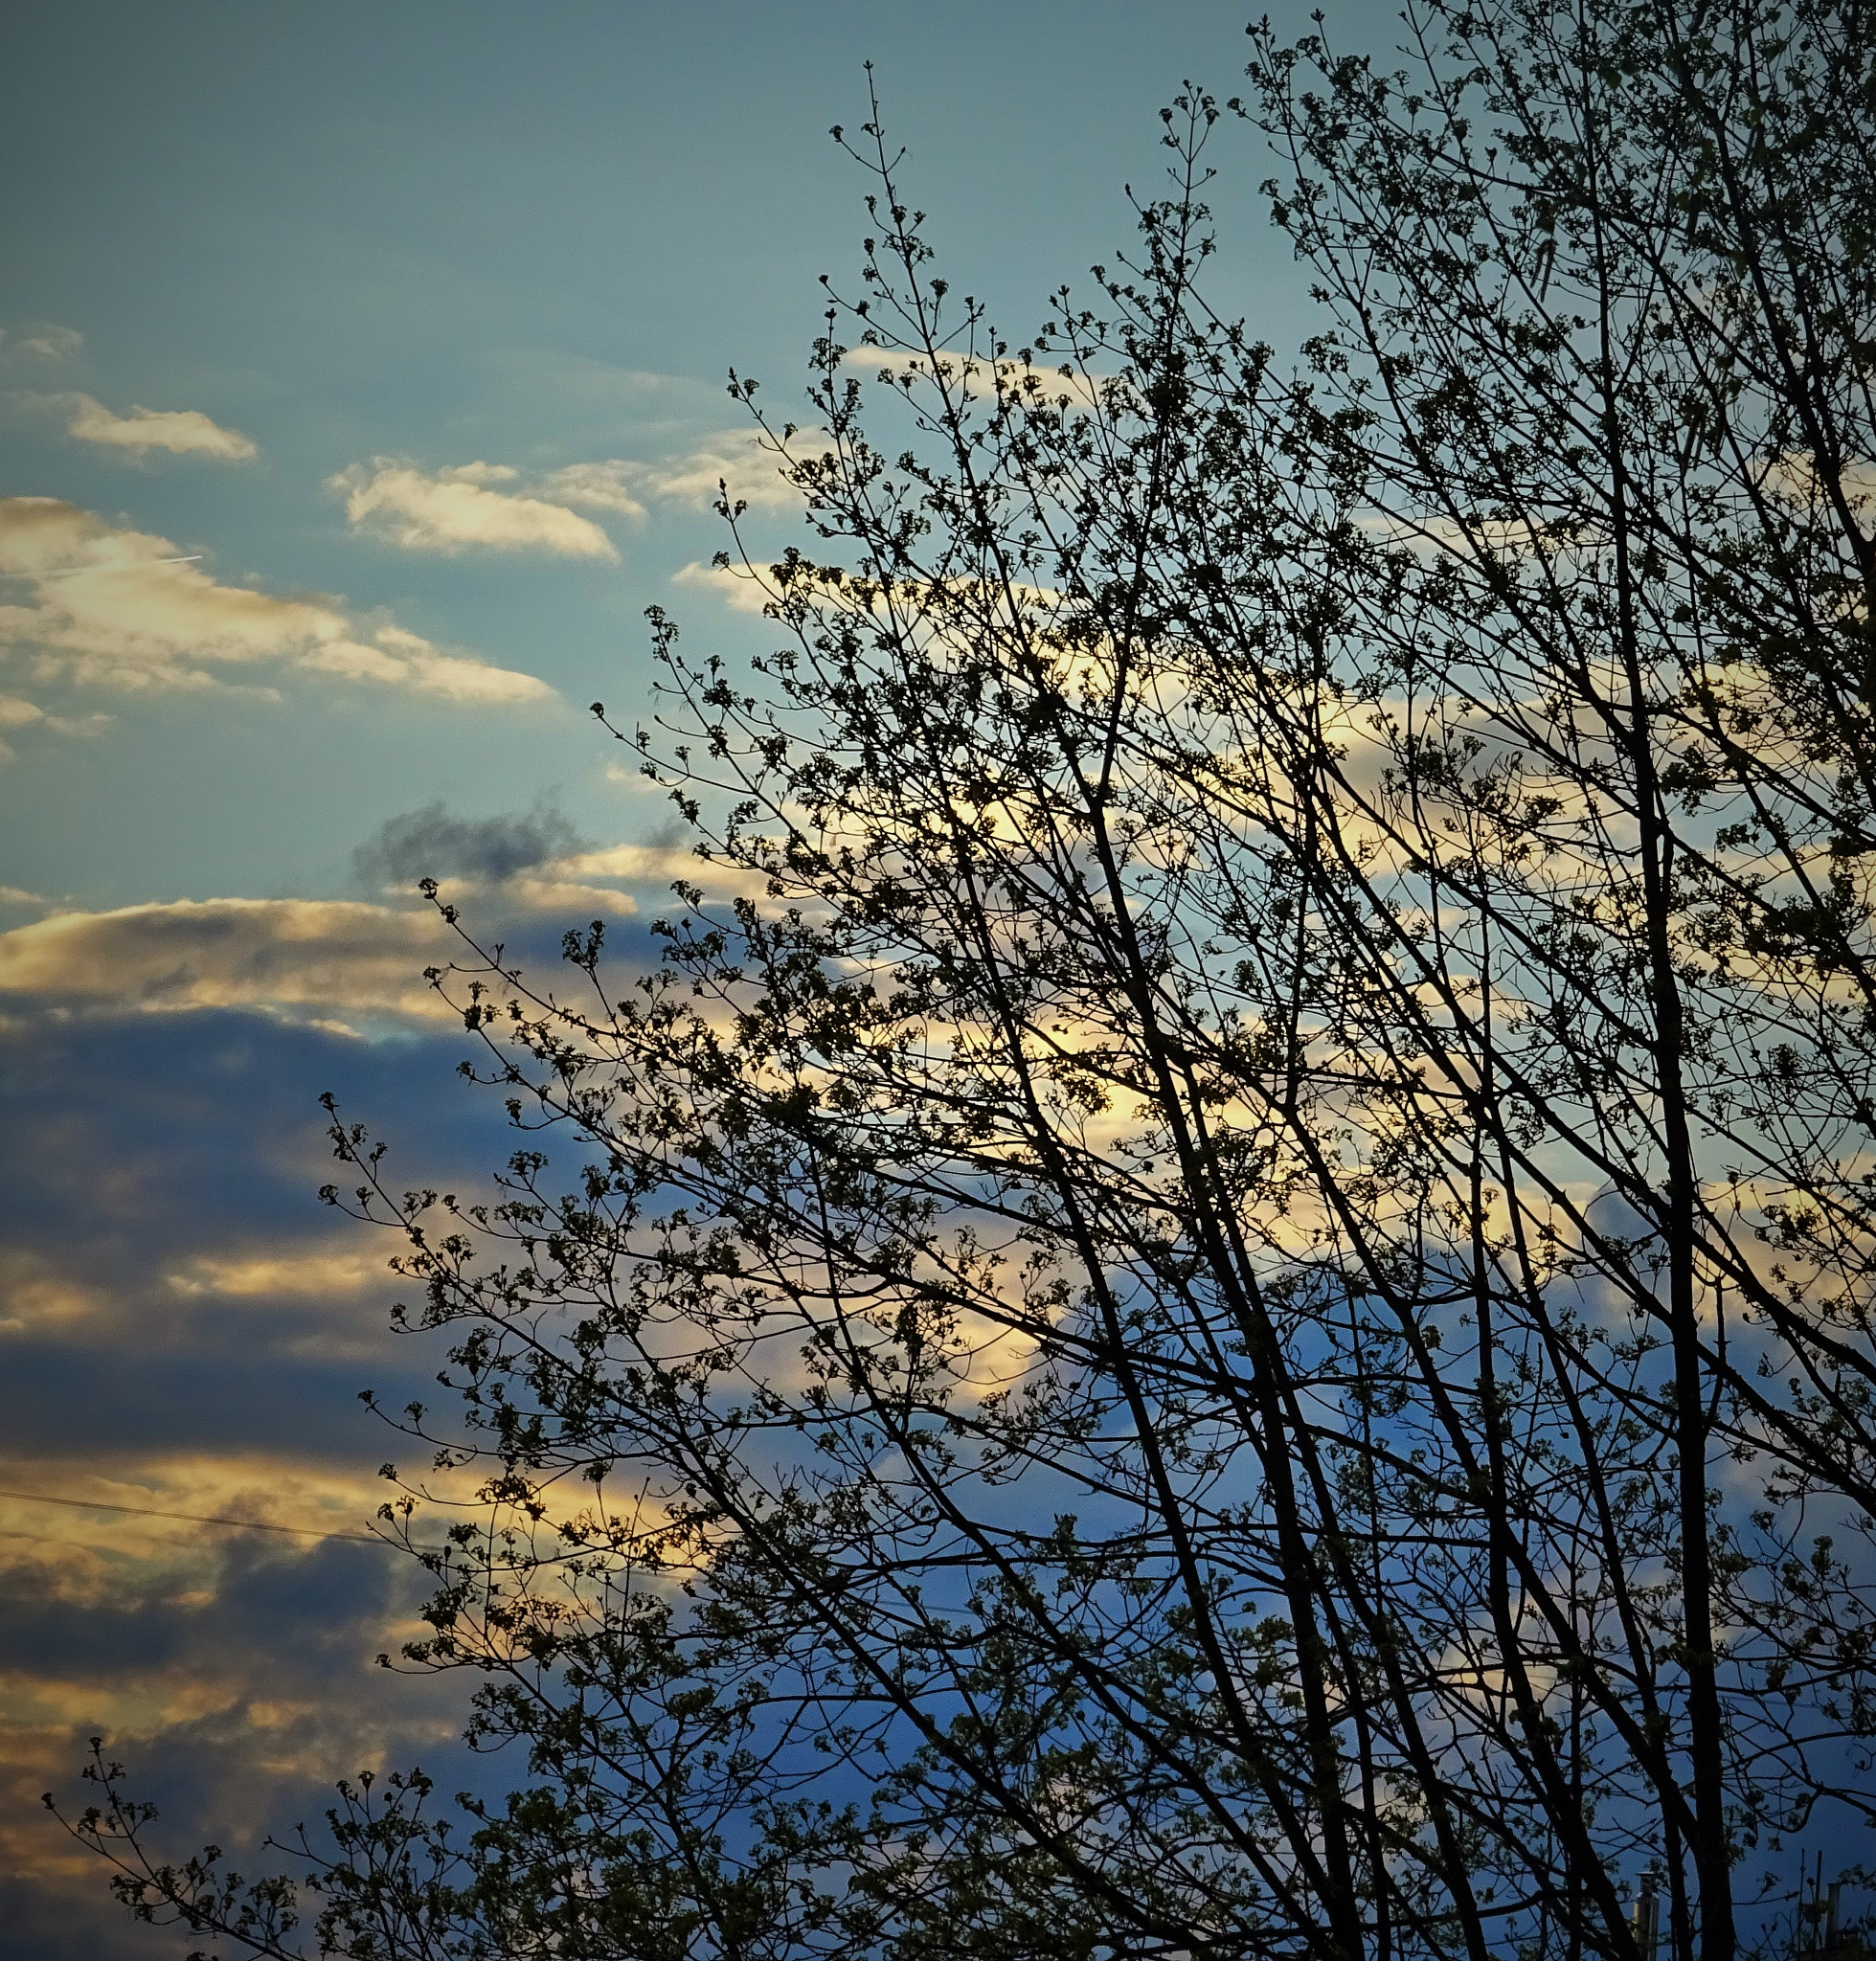 Evening clouds. by vita.tucaite